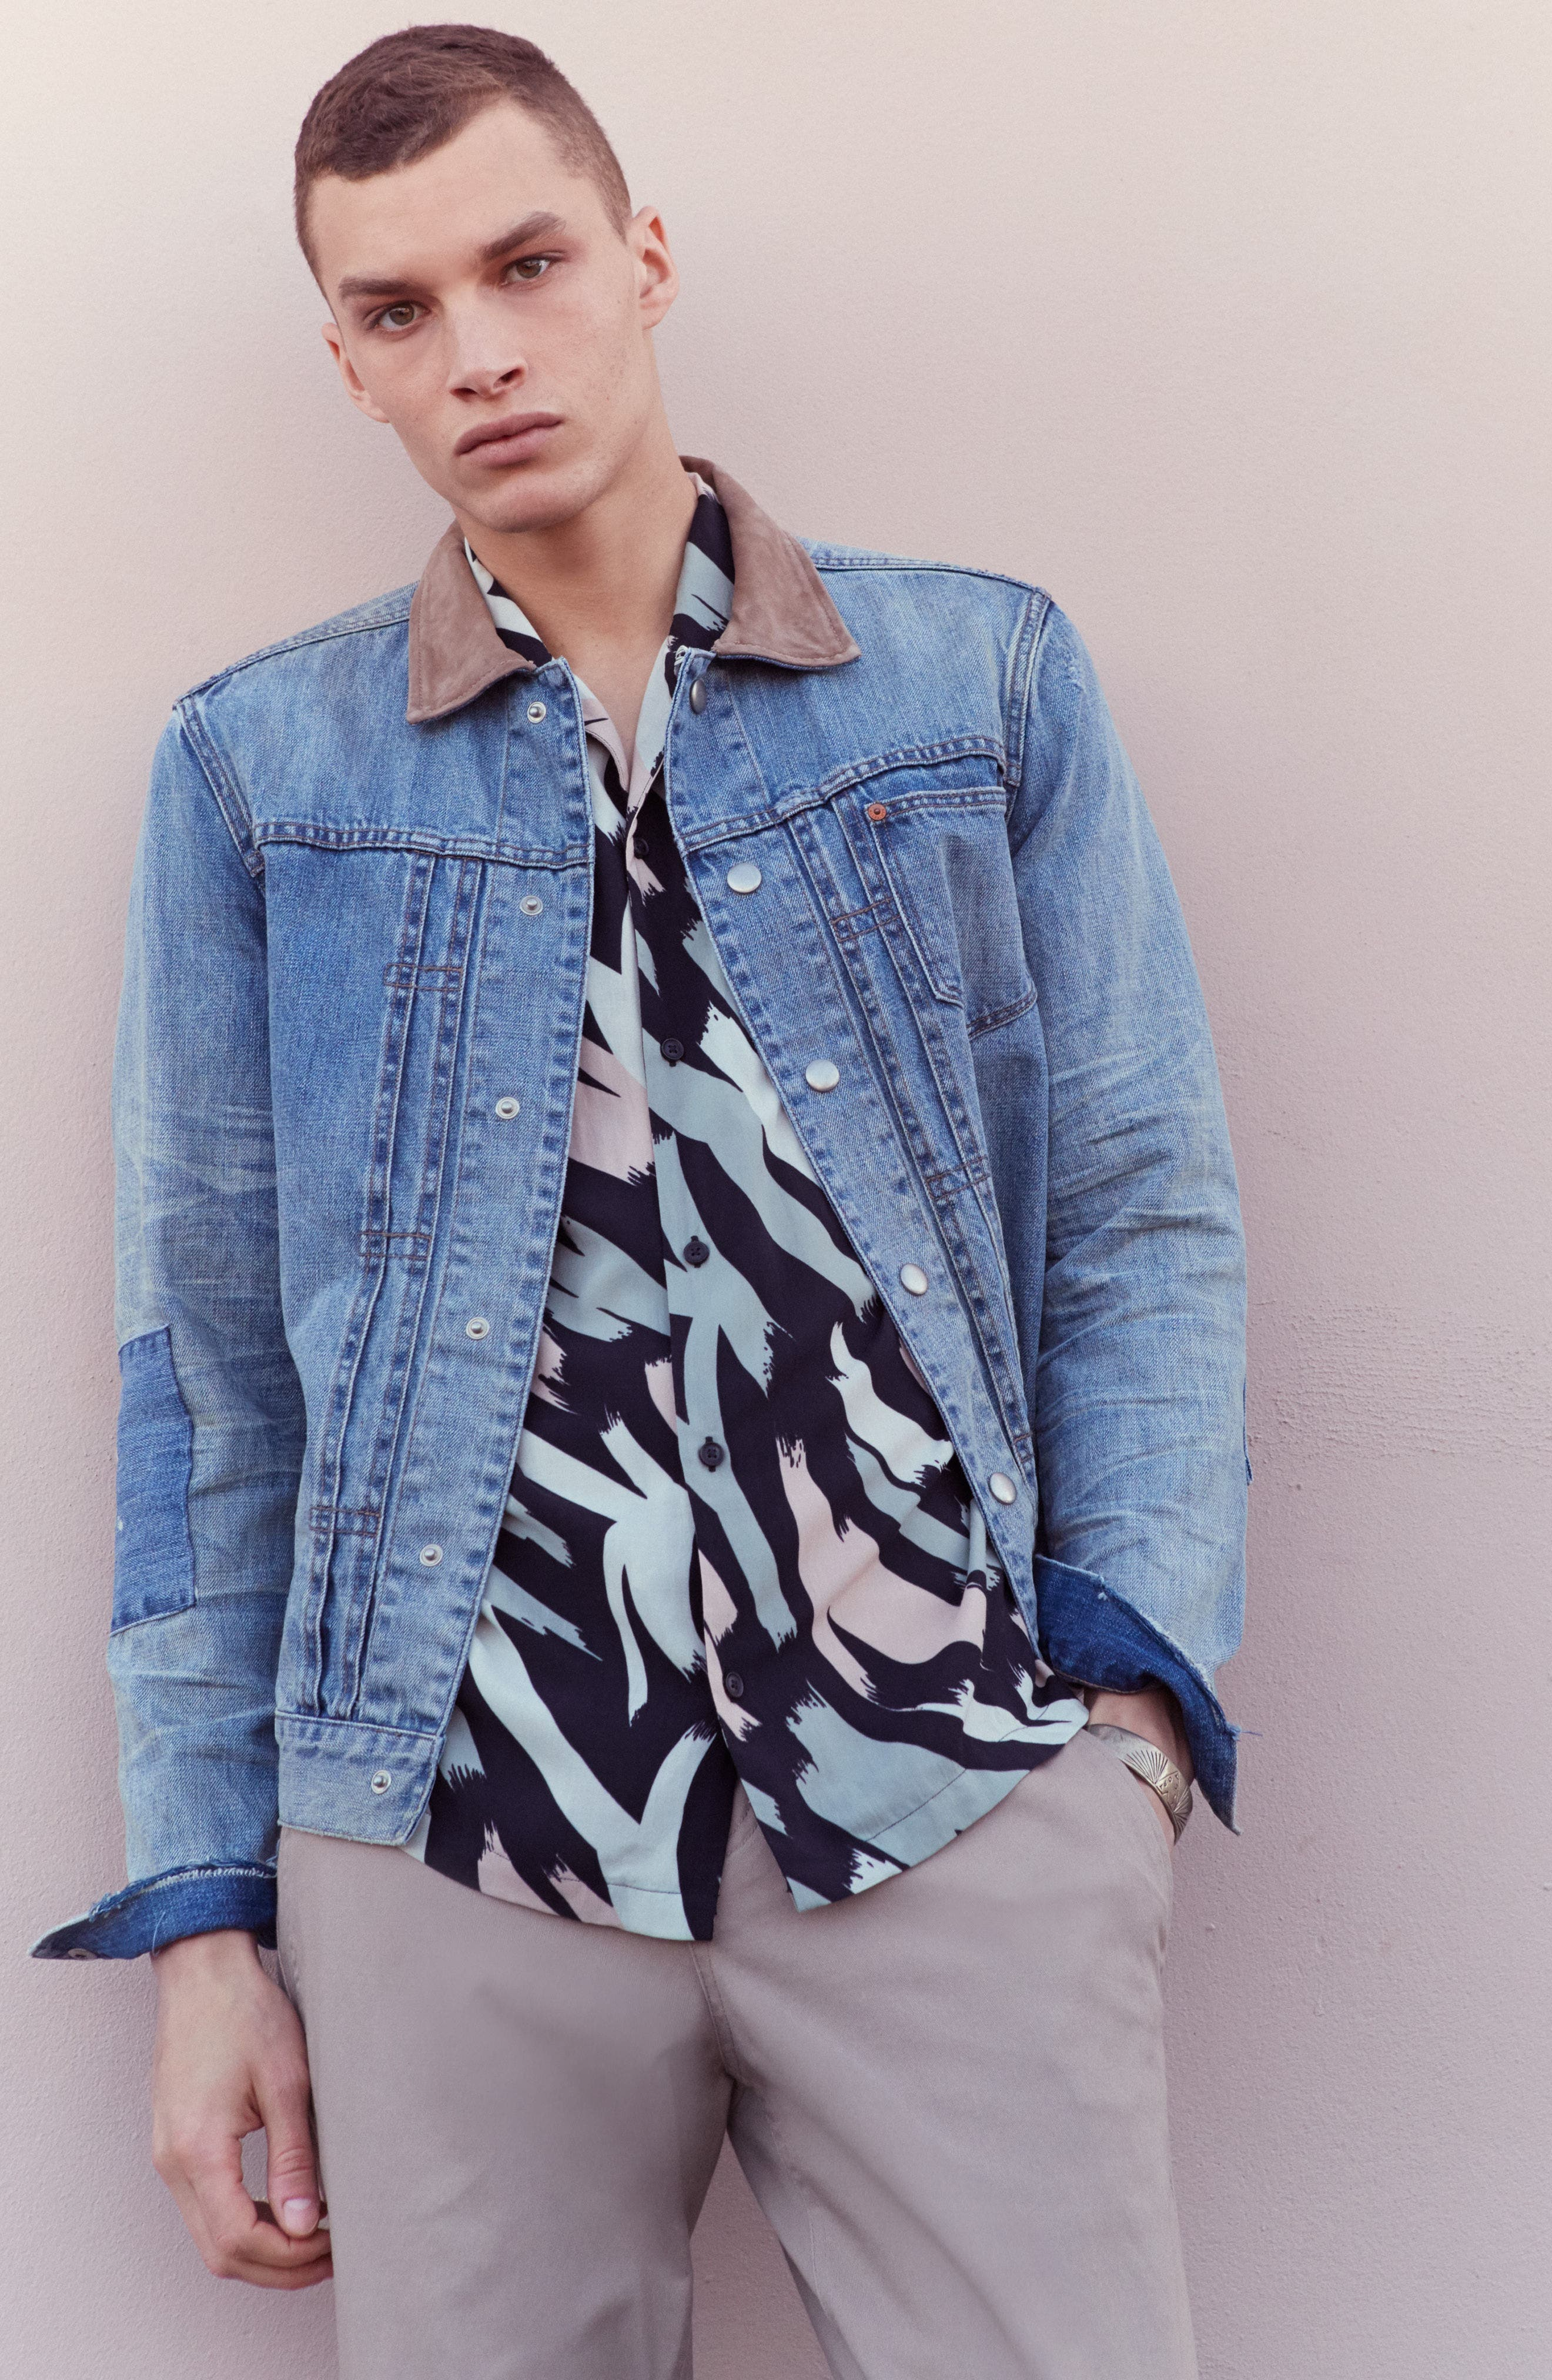 Ibanex Slim Fit Distressed Denim Jacket,                             Alternate thumbnail 5, color,                             460